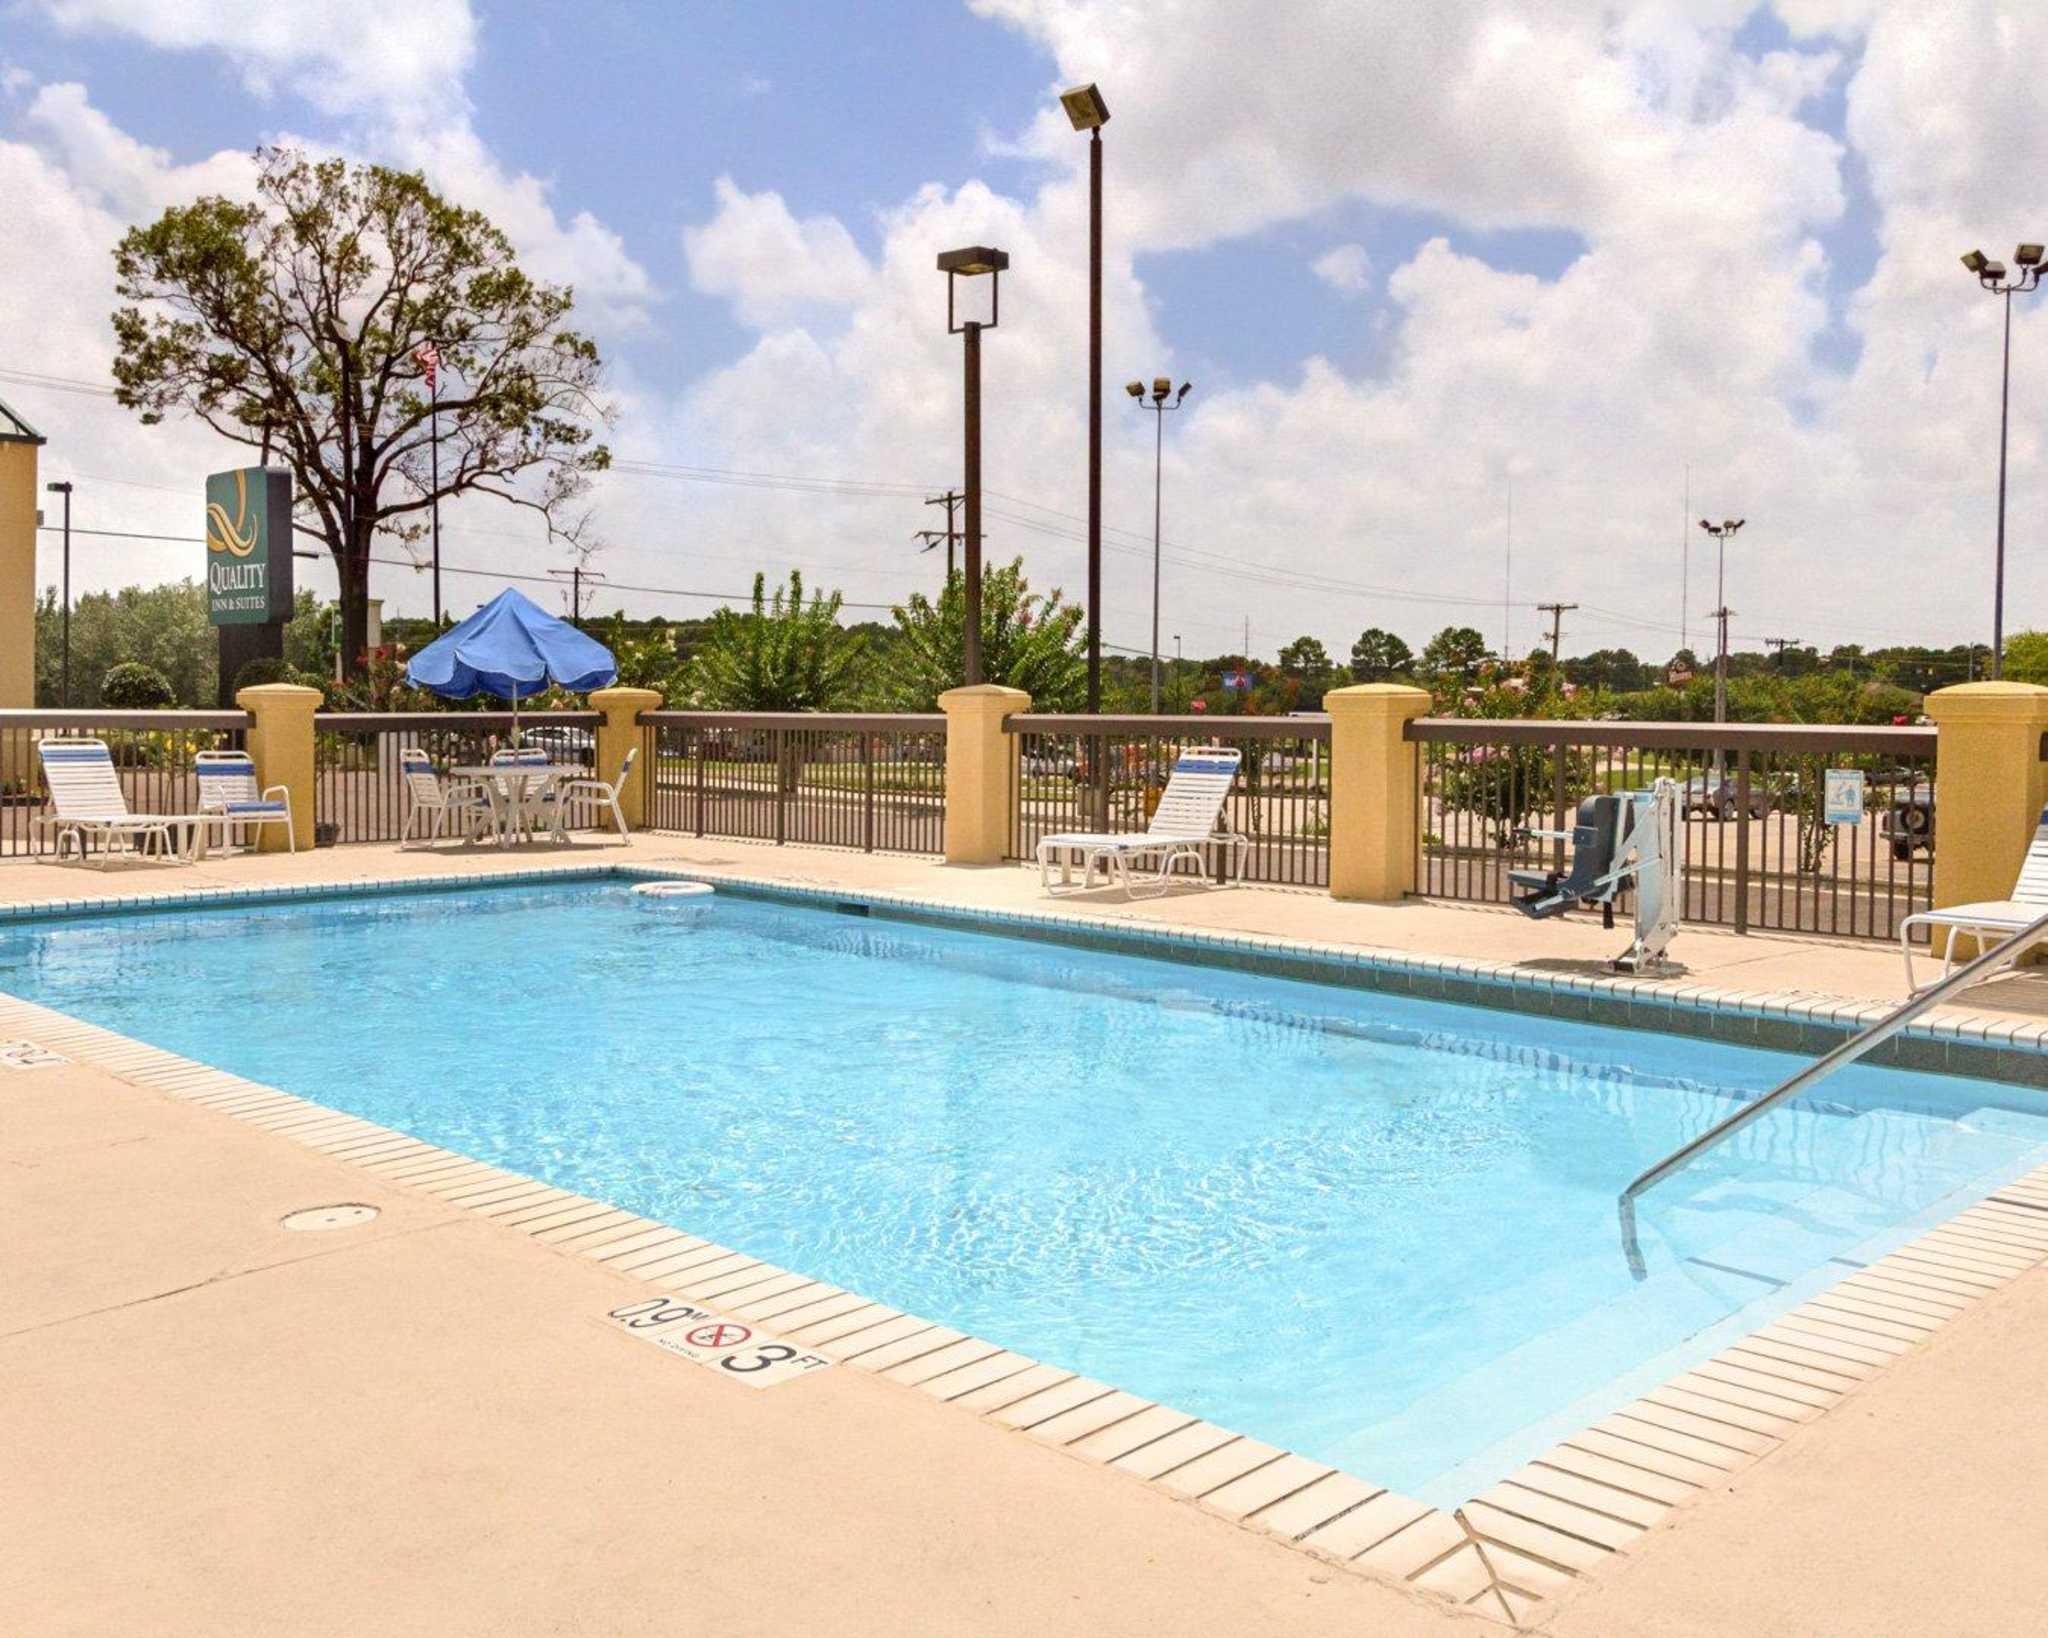 Quality Inn & Suites Southwest image 17